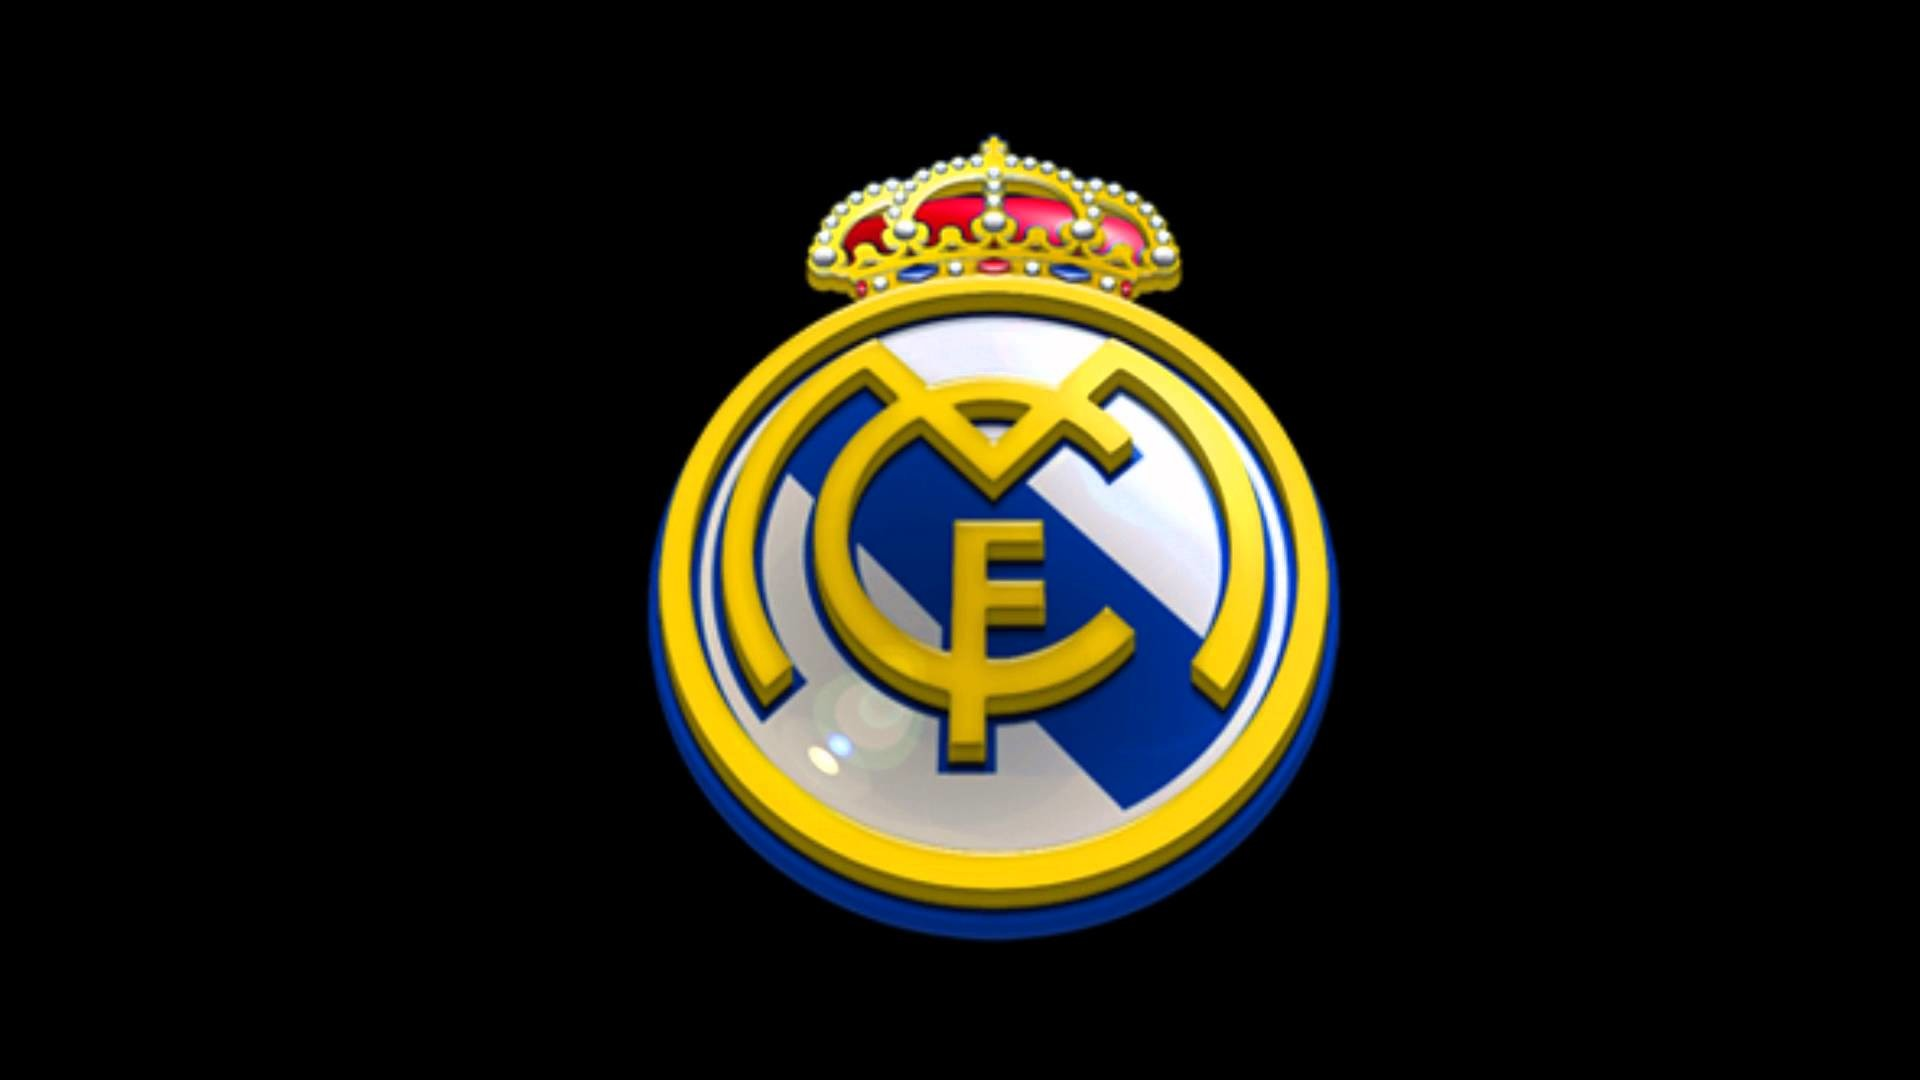 1920x1080 Logo Real Madrid Background 2.